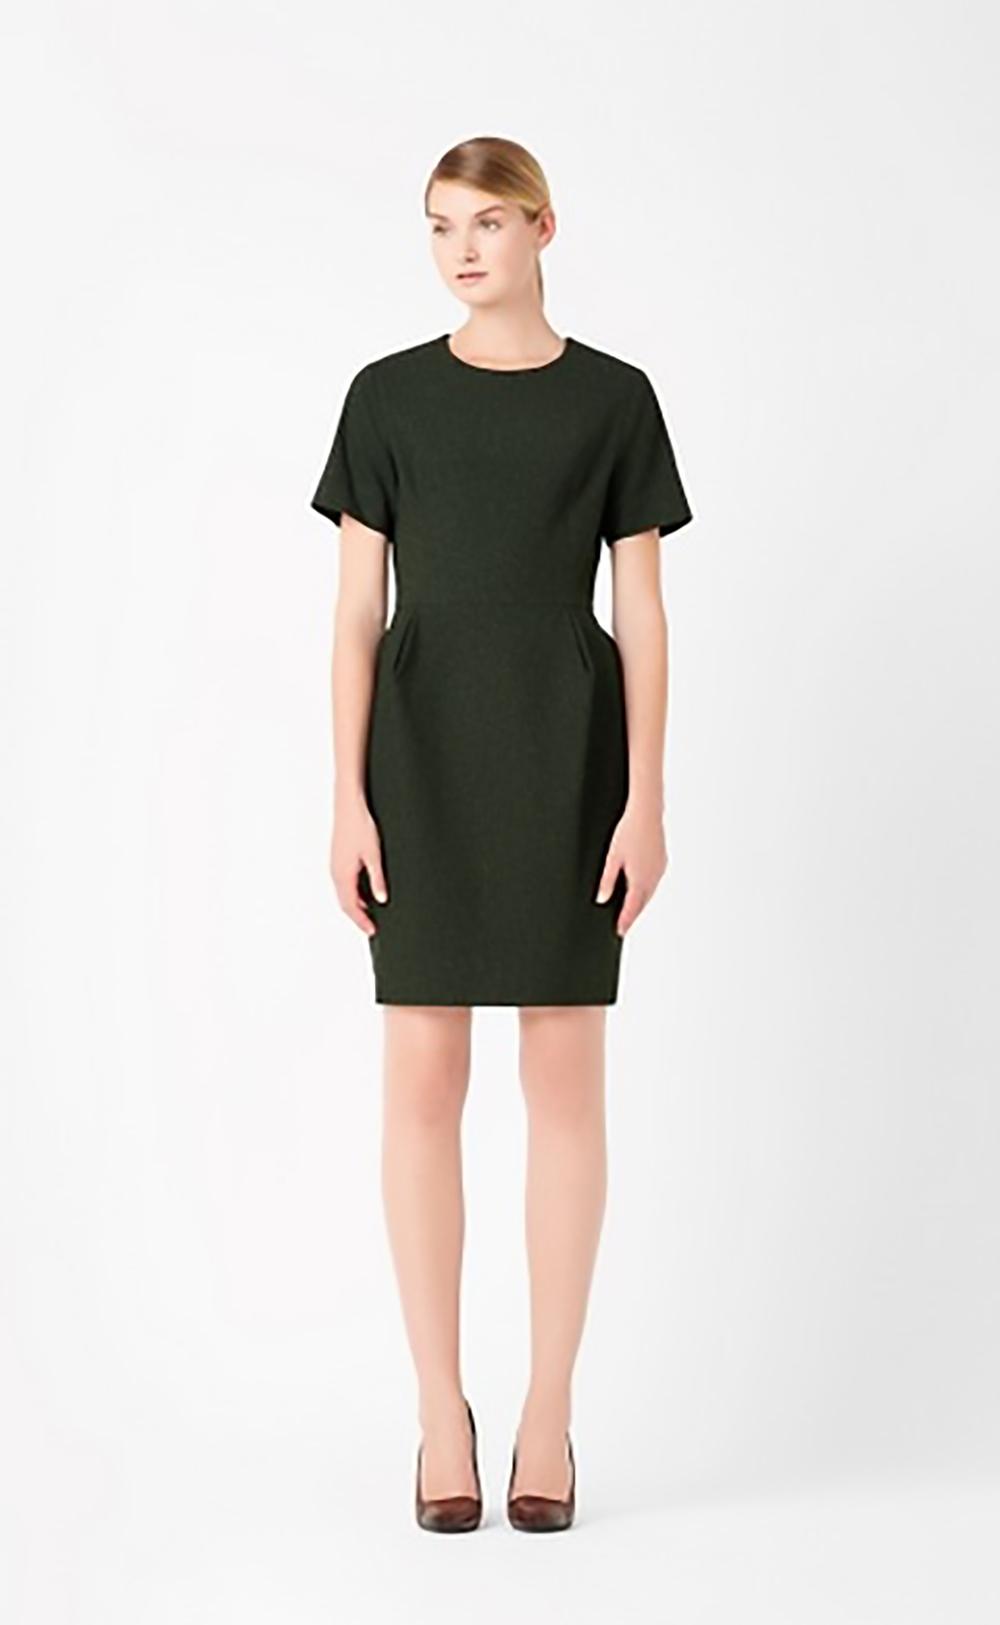 cos sculpted pleat dress COS 1500.jpg